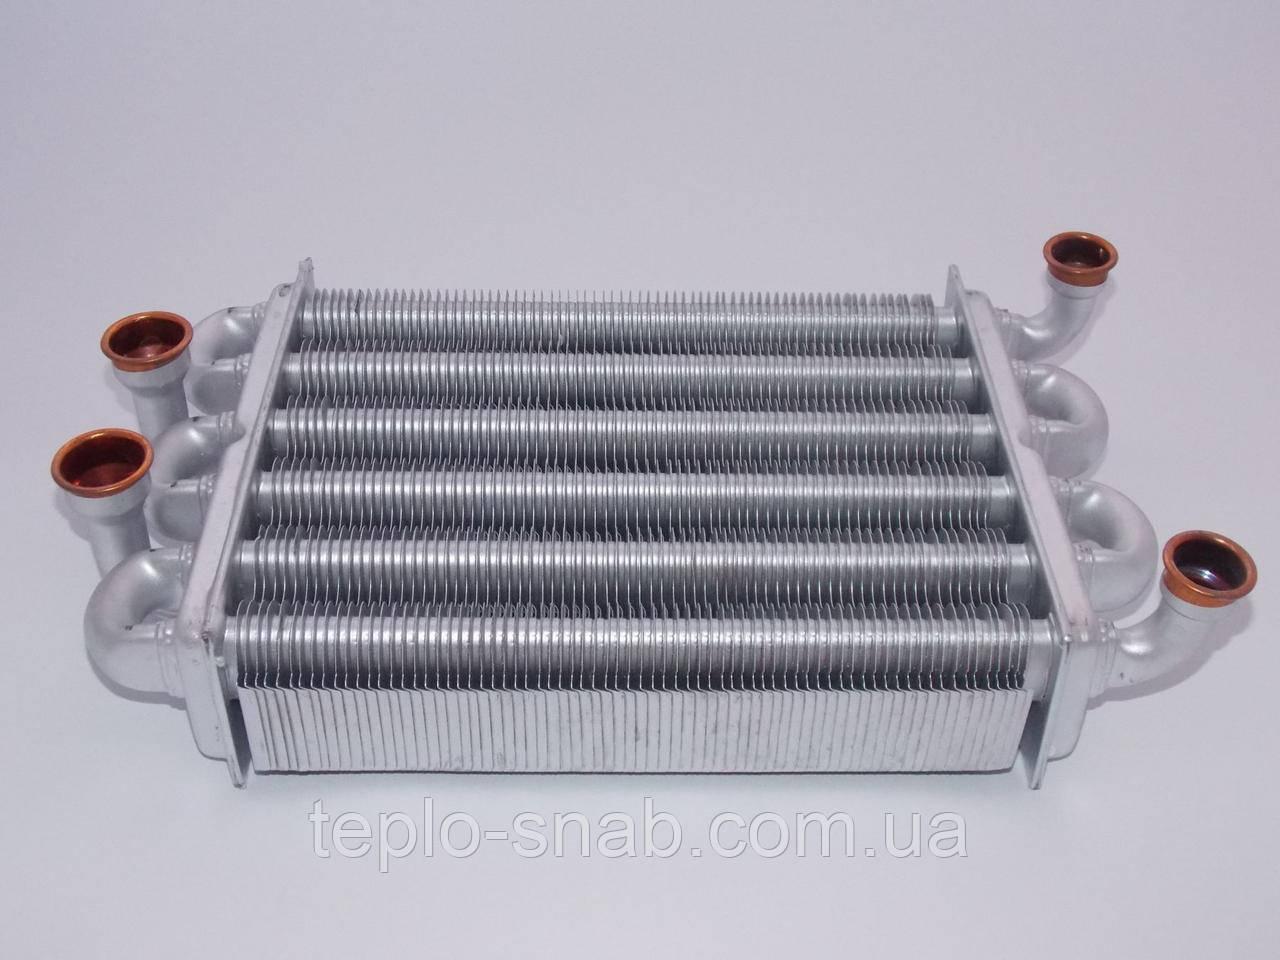 Теплообменник битермический Immergas Star 24 3 E/Alpha Boilers CB 24 TF/CB 24 TN (Клипса). 1.024398